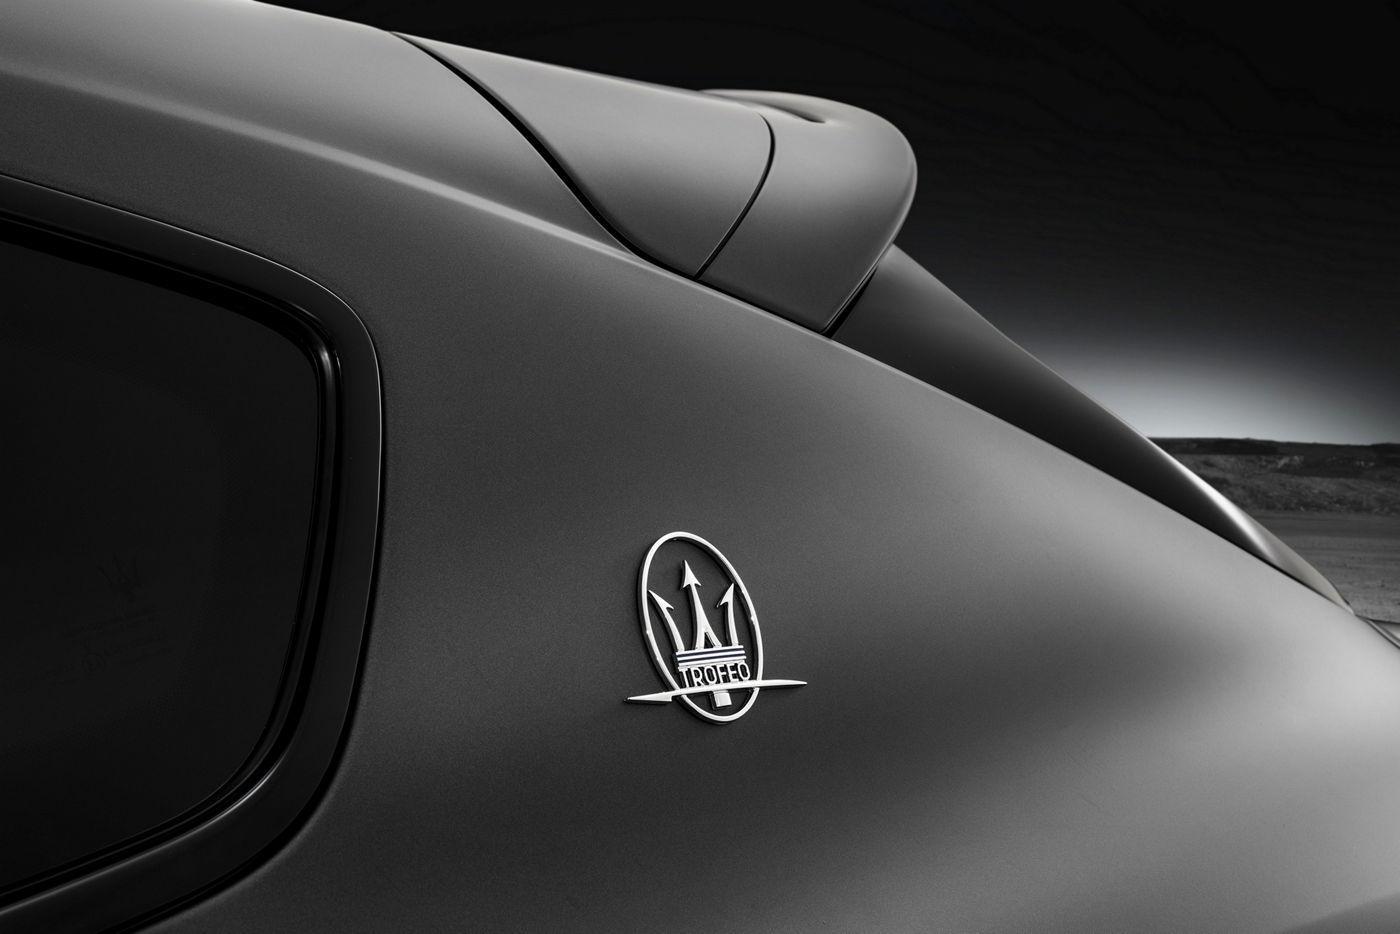 Focusing on the exclusive Maserati Trofeo Logo on Maserati Levante Trofeo body